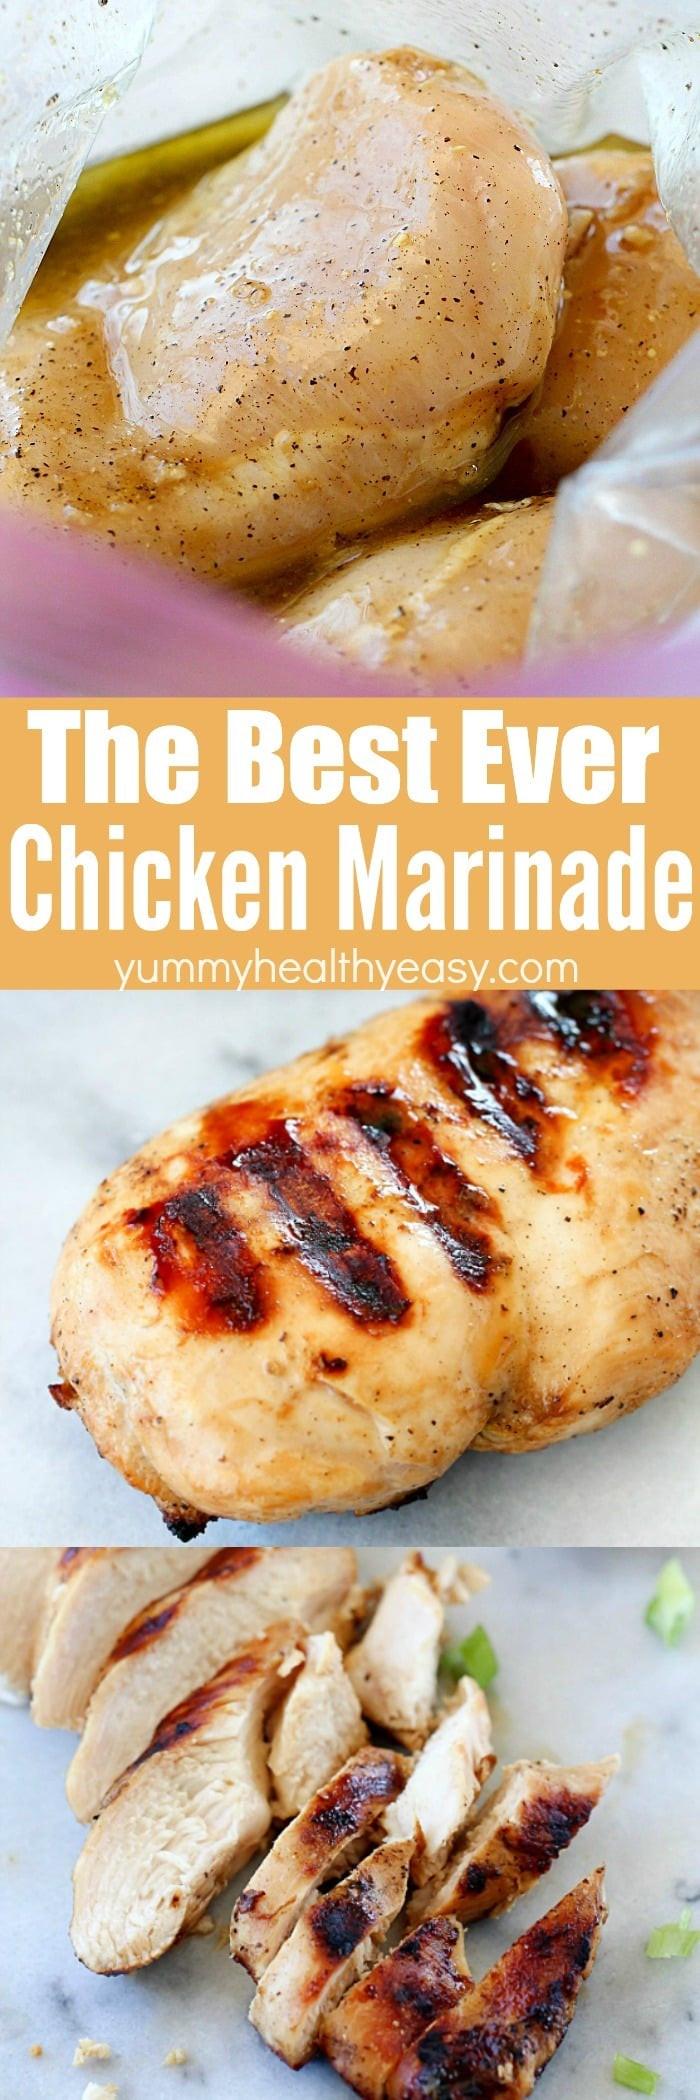 Healthy Chicken Marinades  The Best Chicken Marinade Recipe Yummy Healthy Easy